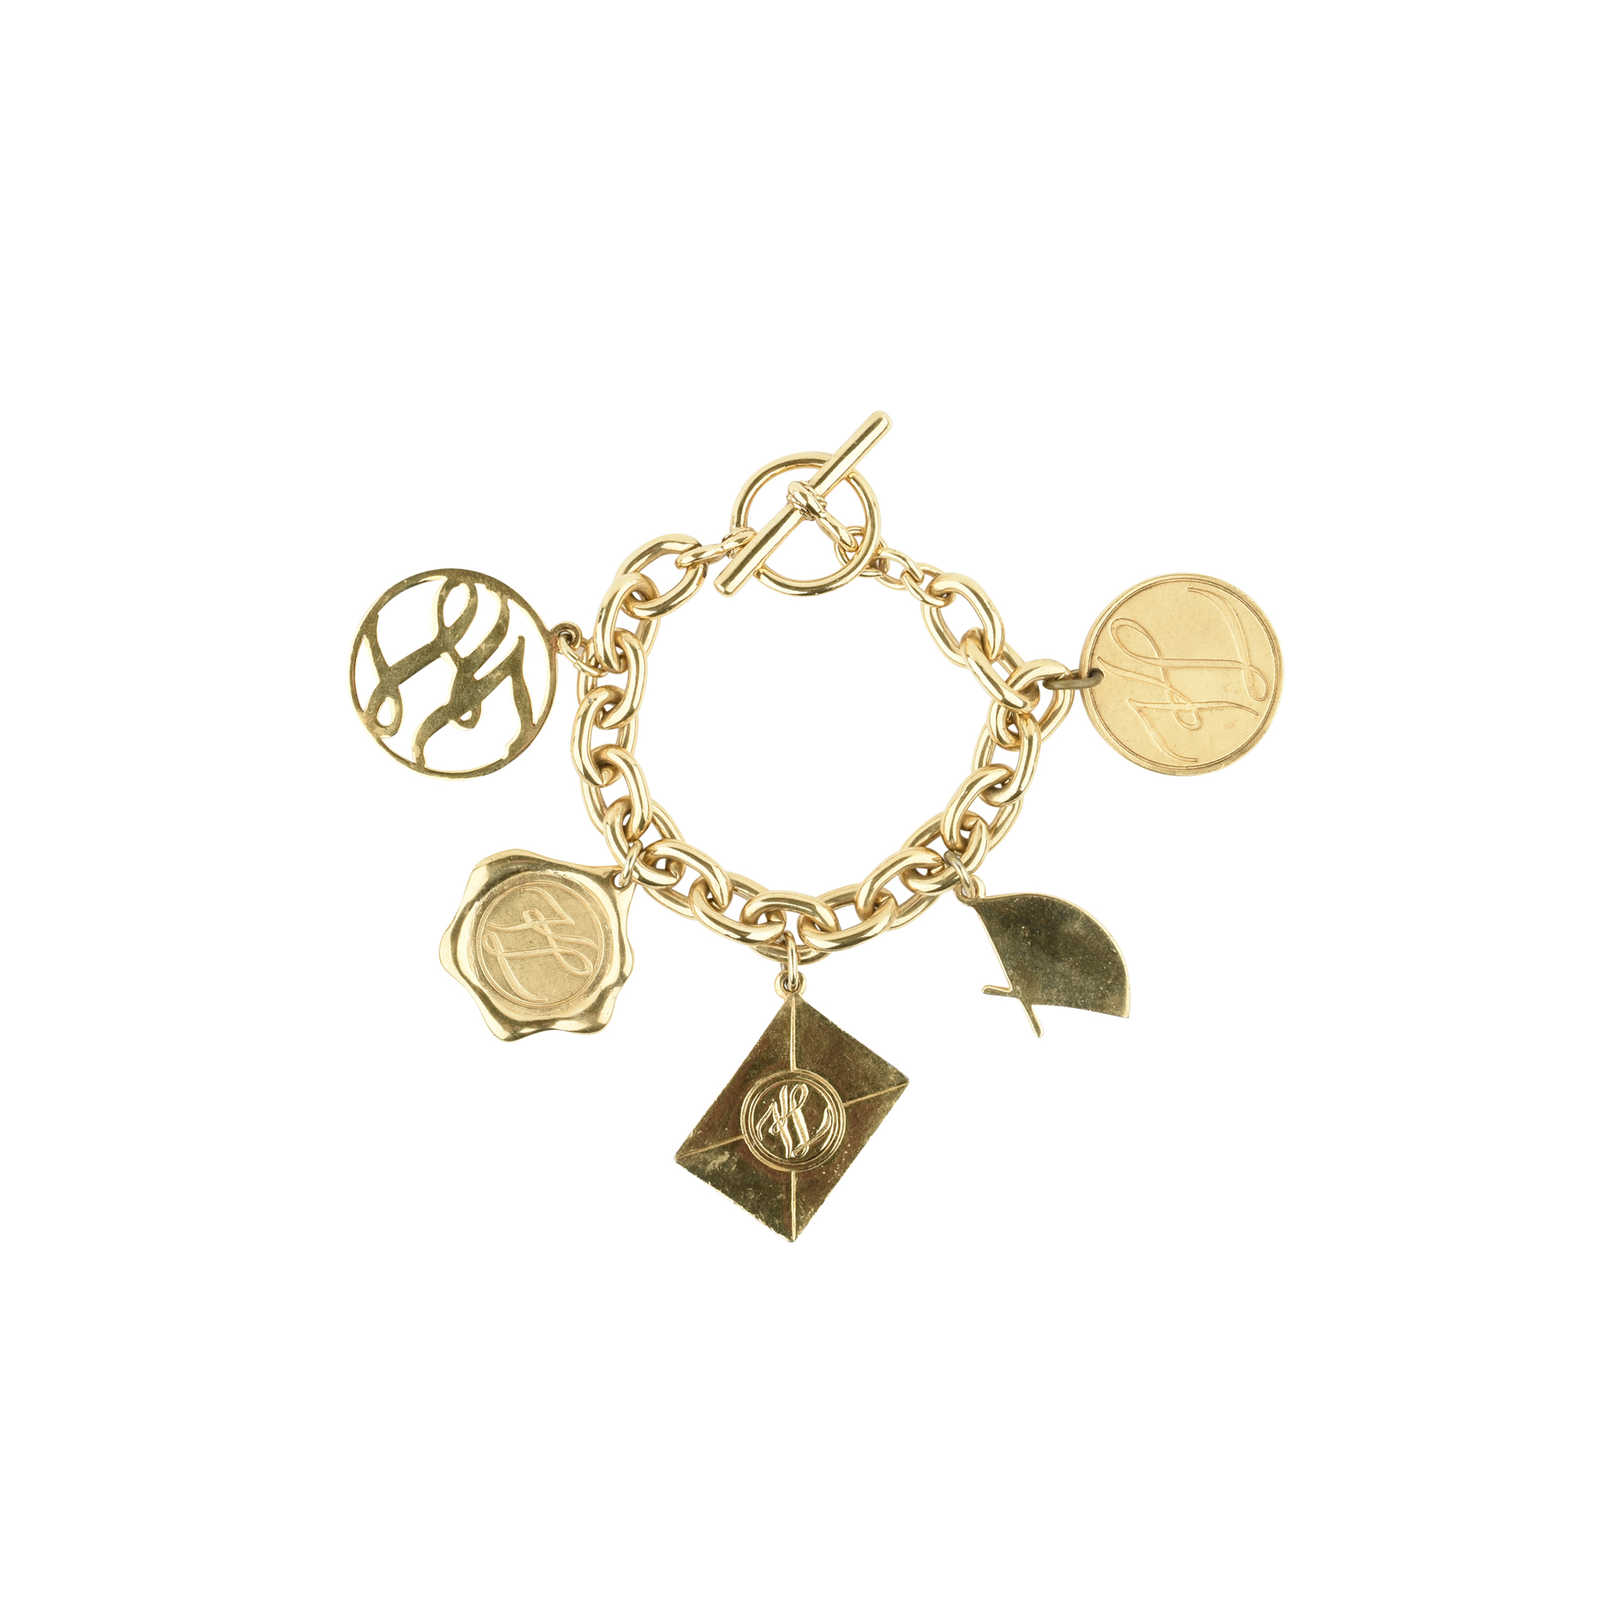 Karl Lagerfeld Gold Plated Charm Bracelet xK2da